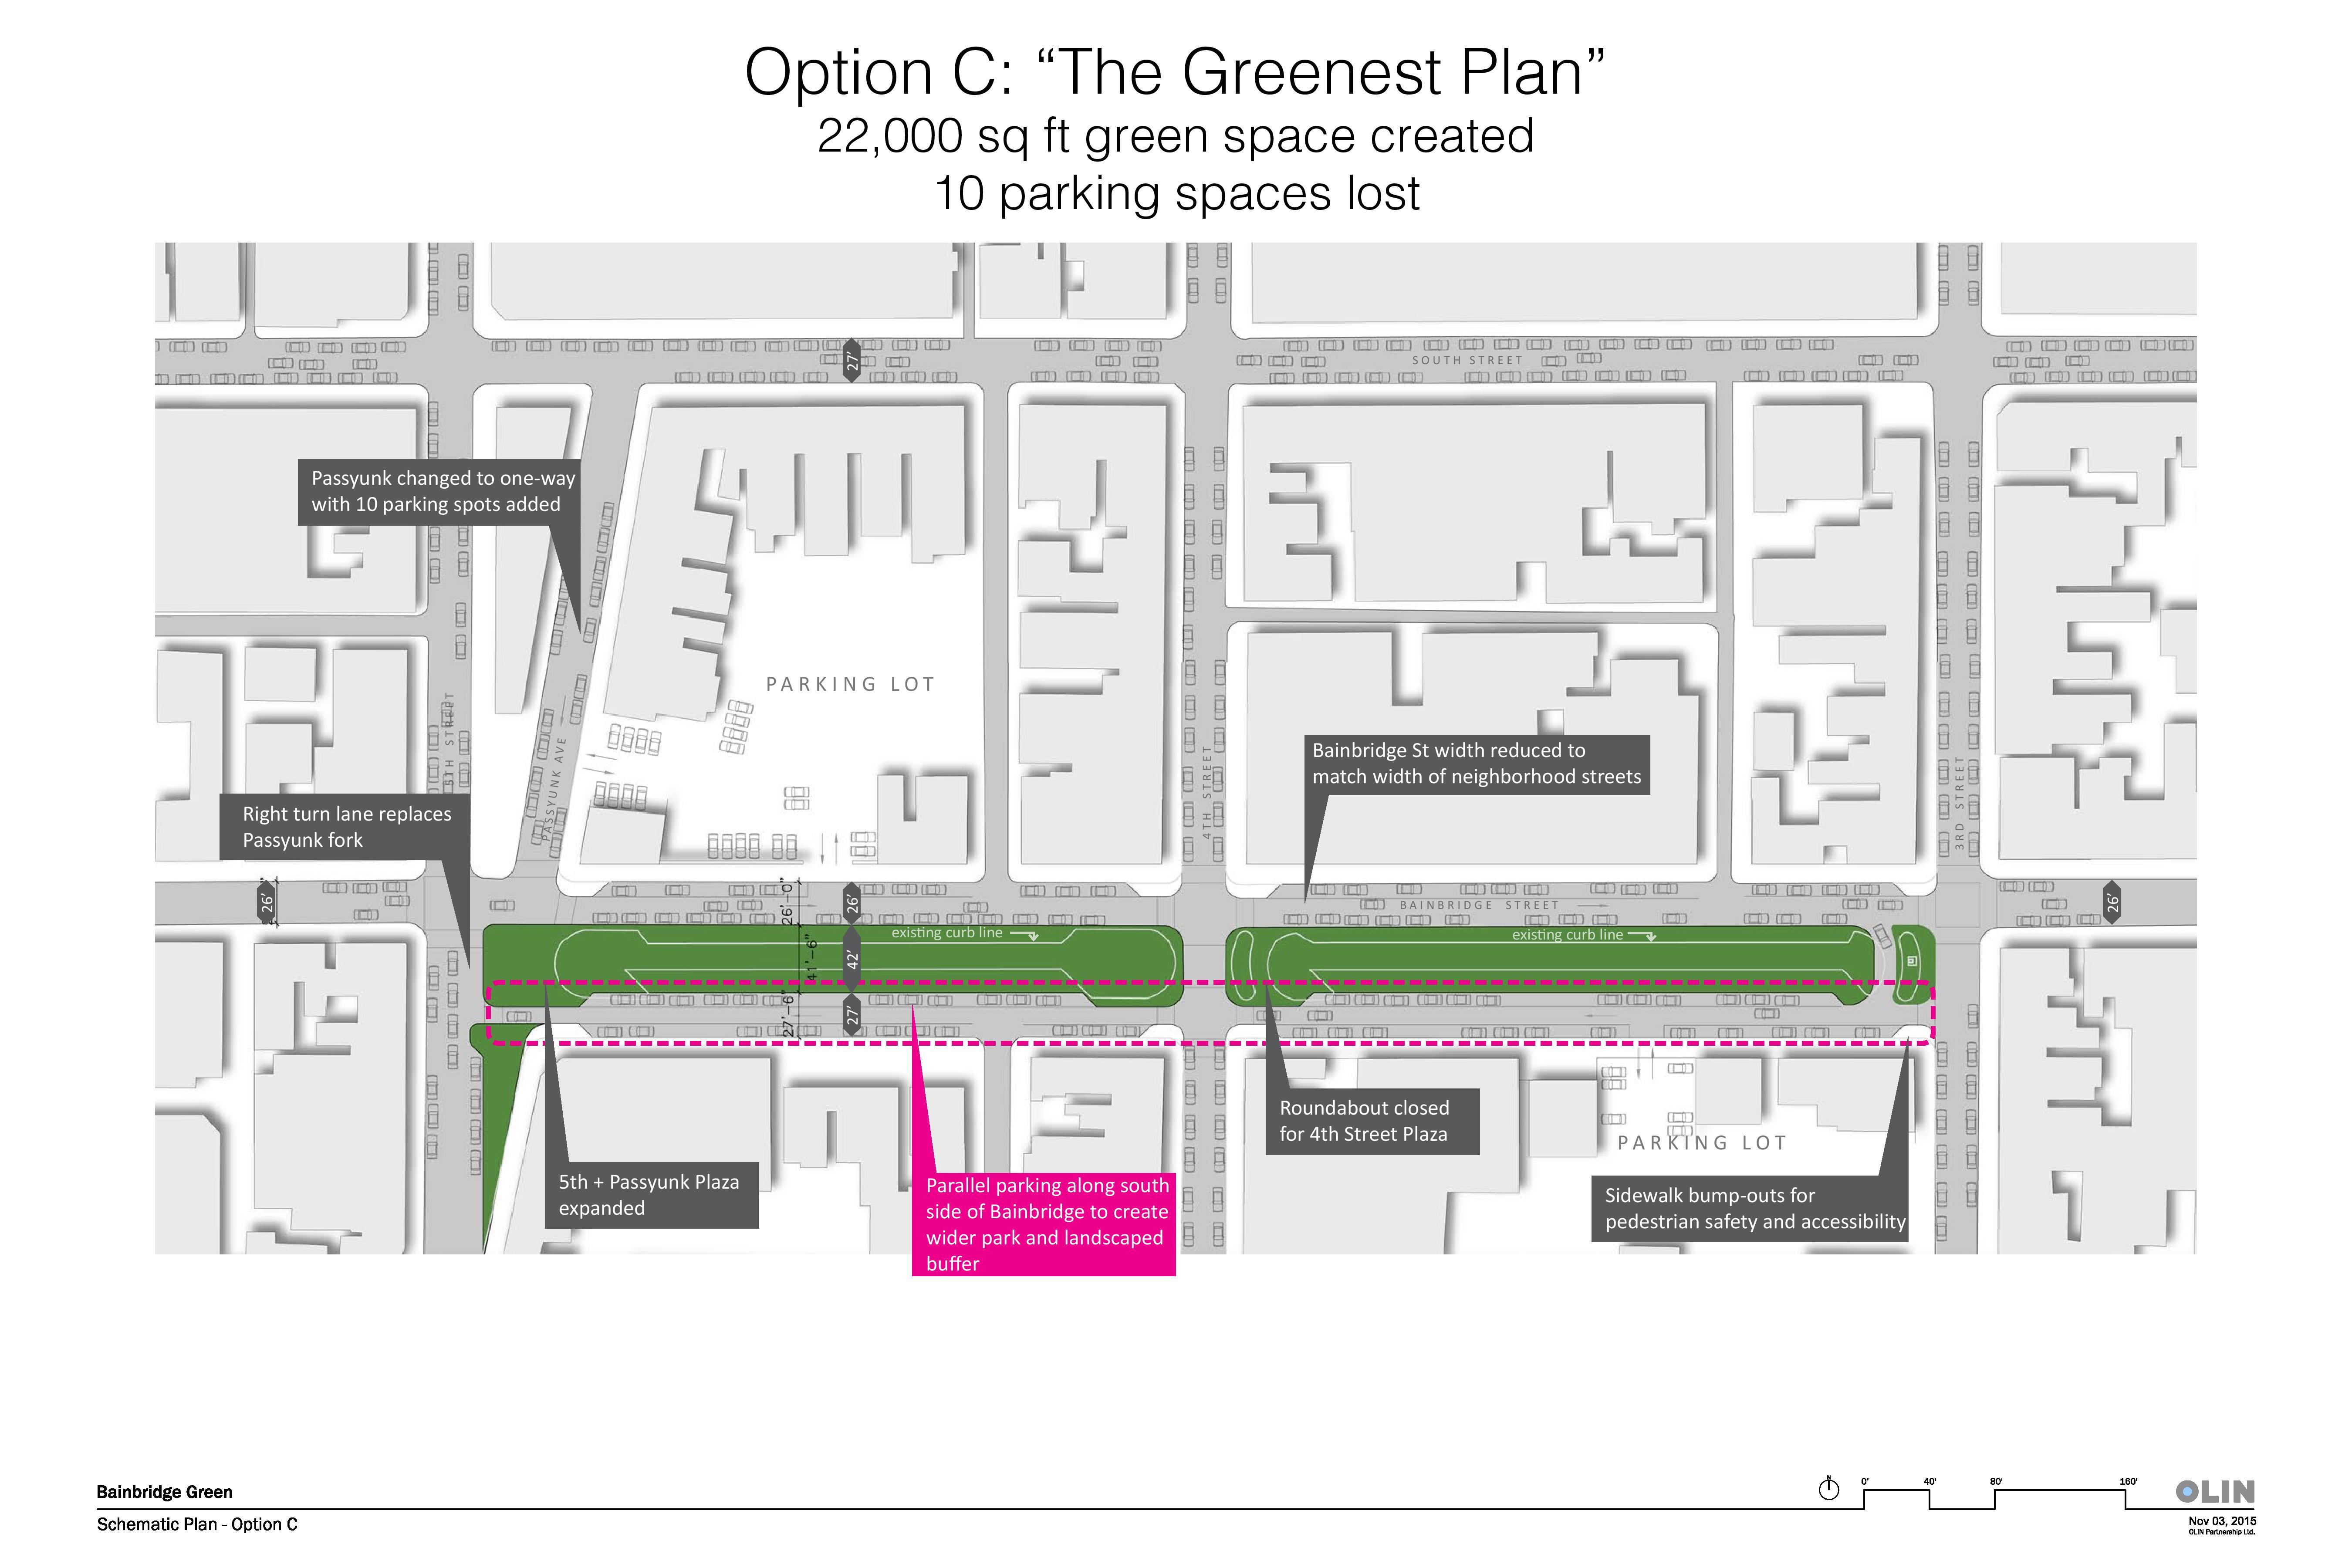 bainbridge-green-option-c